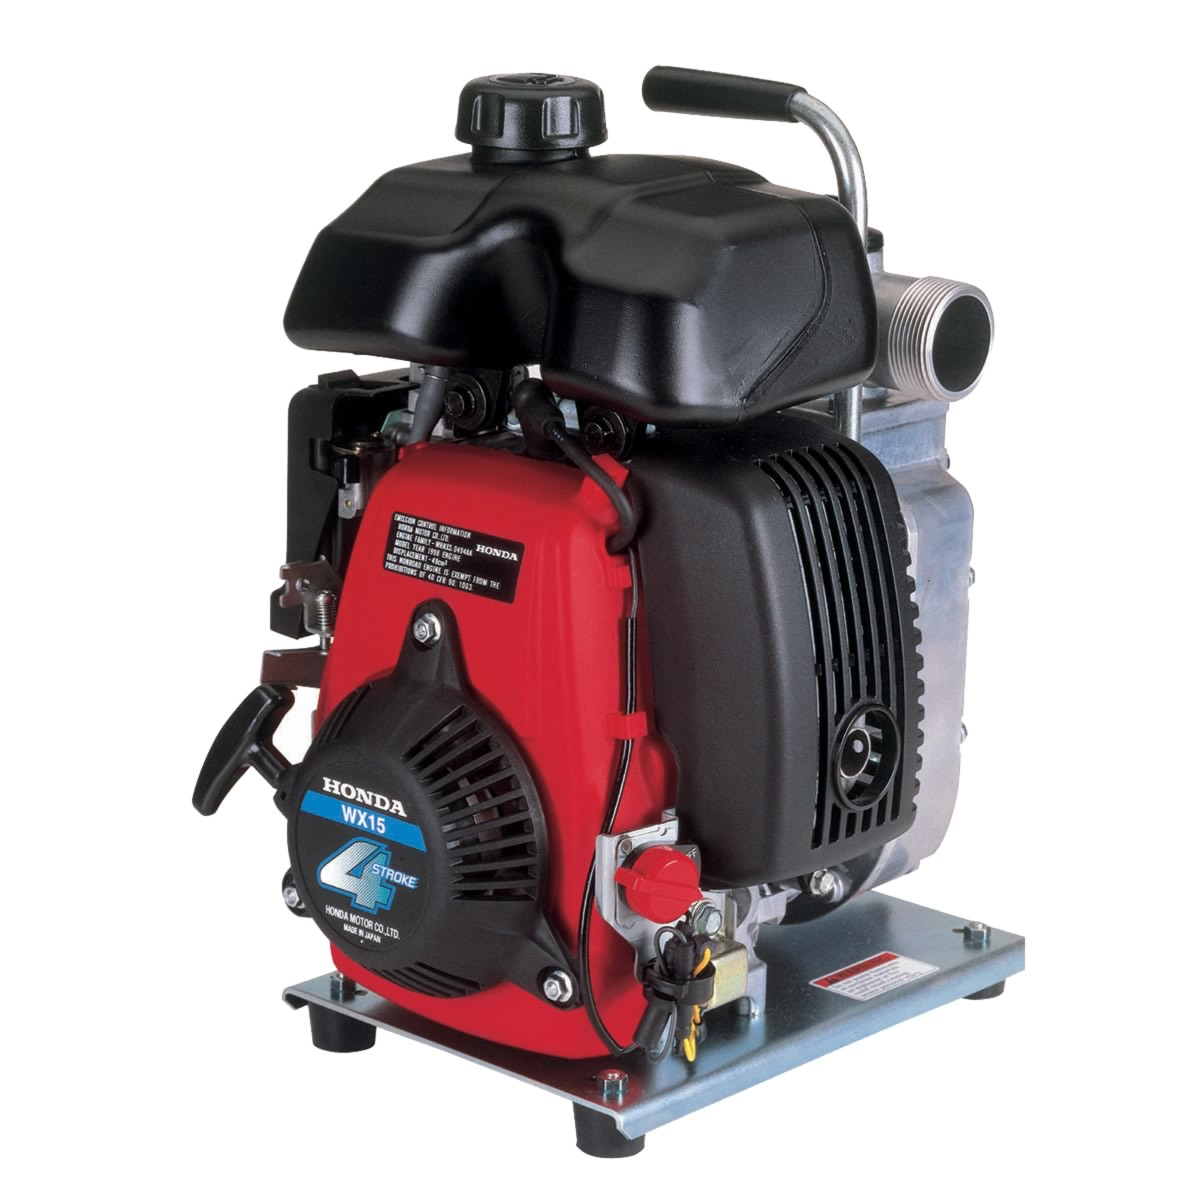 Click image for larger version  Name:Honda pump.jpg Views:65 Size:133.6 KB ID:79368